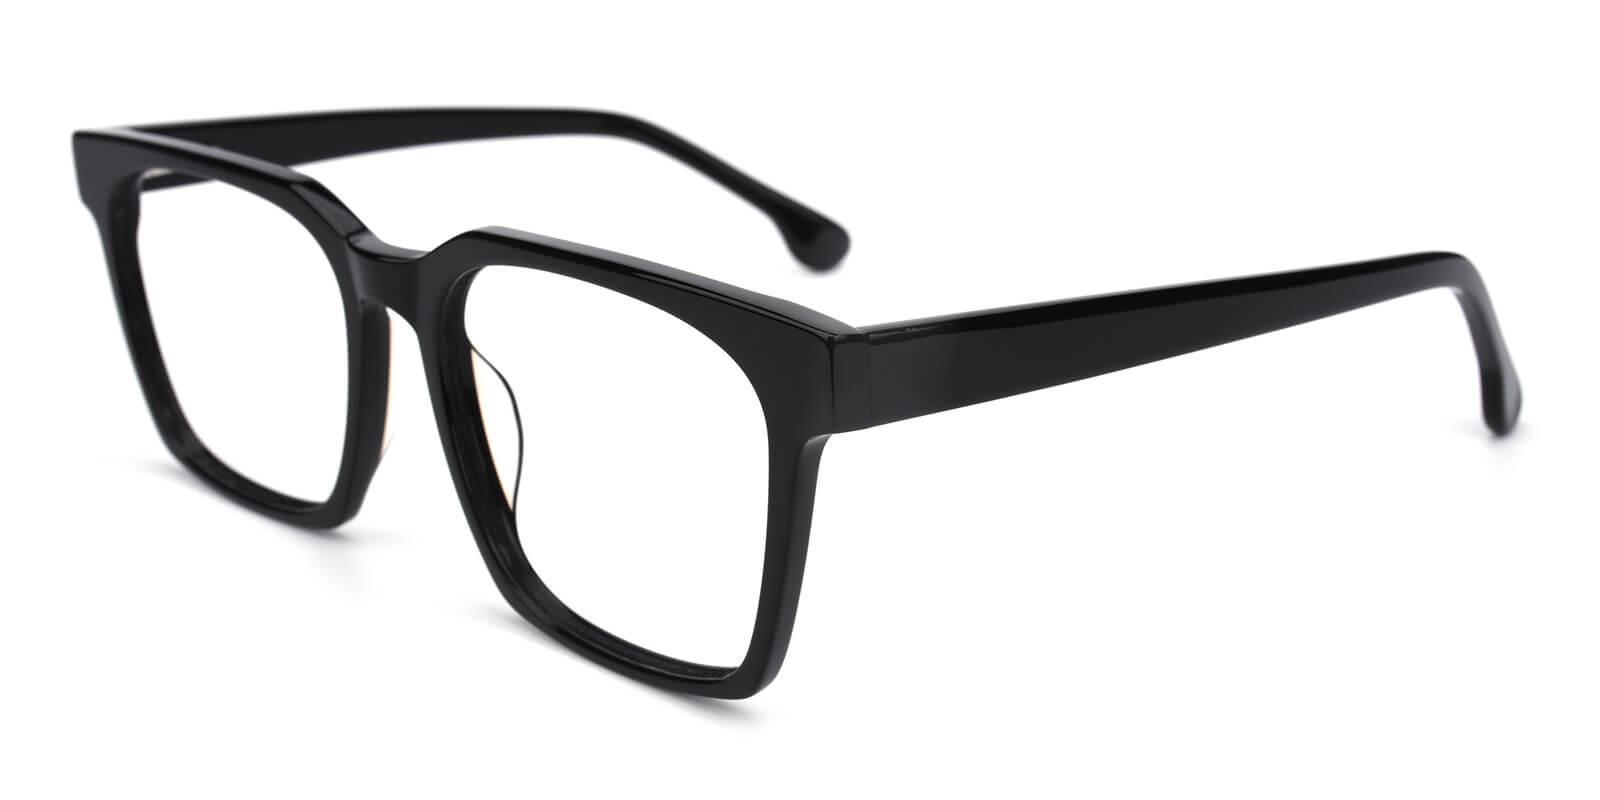 Trapezoid-Black-Square-Acetate-Eyeglasses-additional1